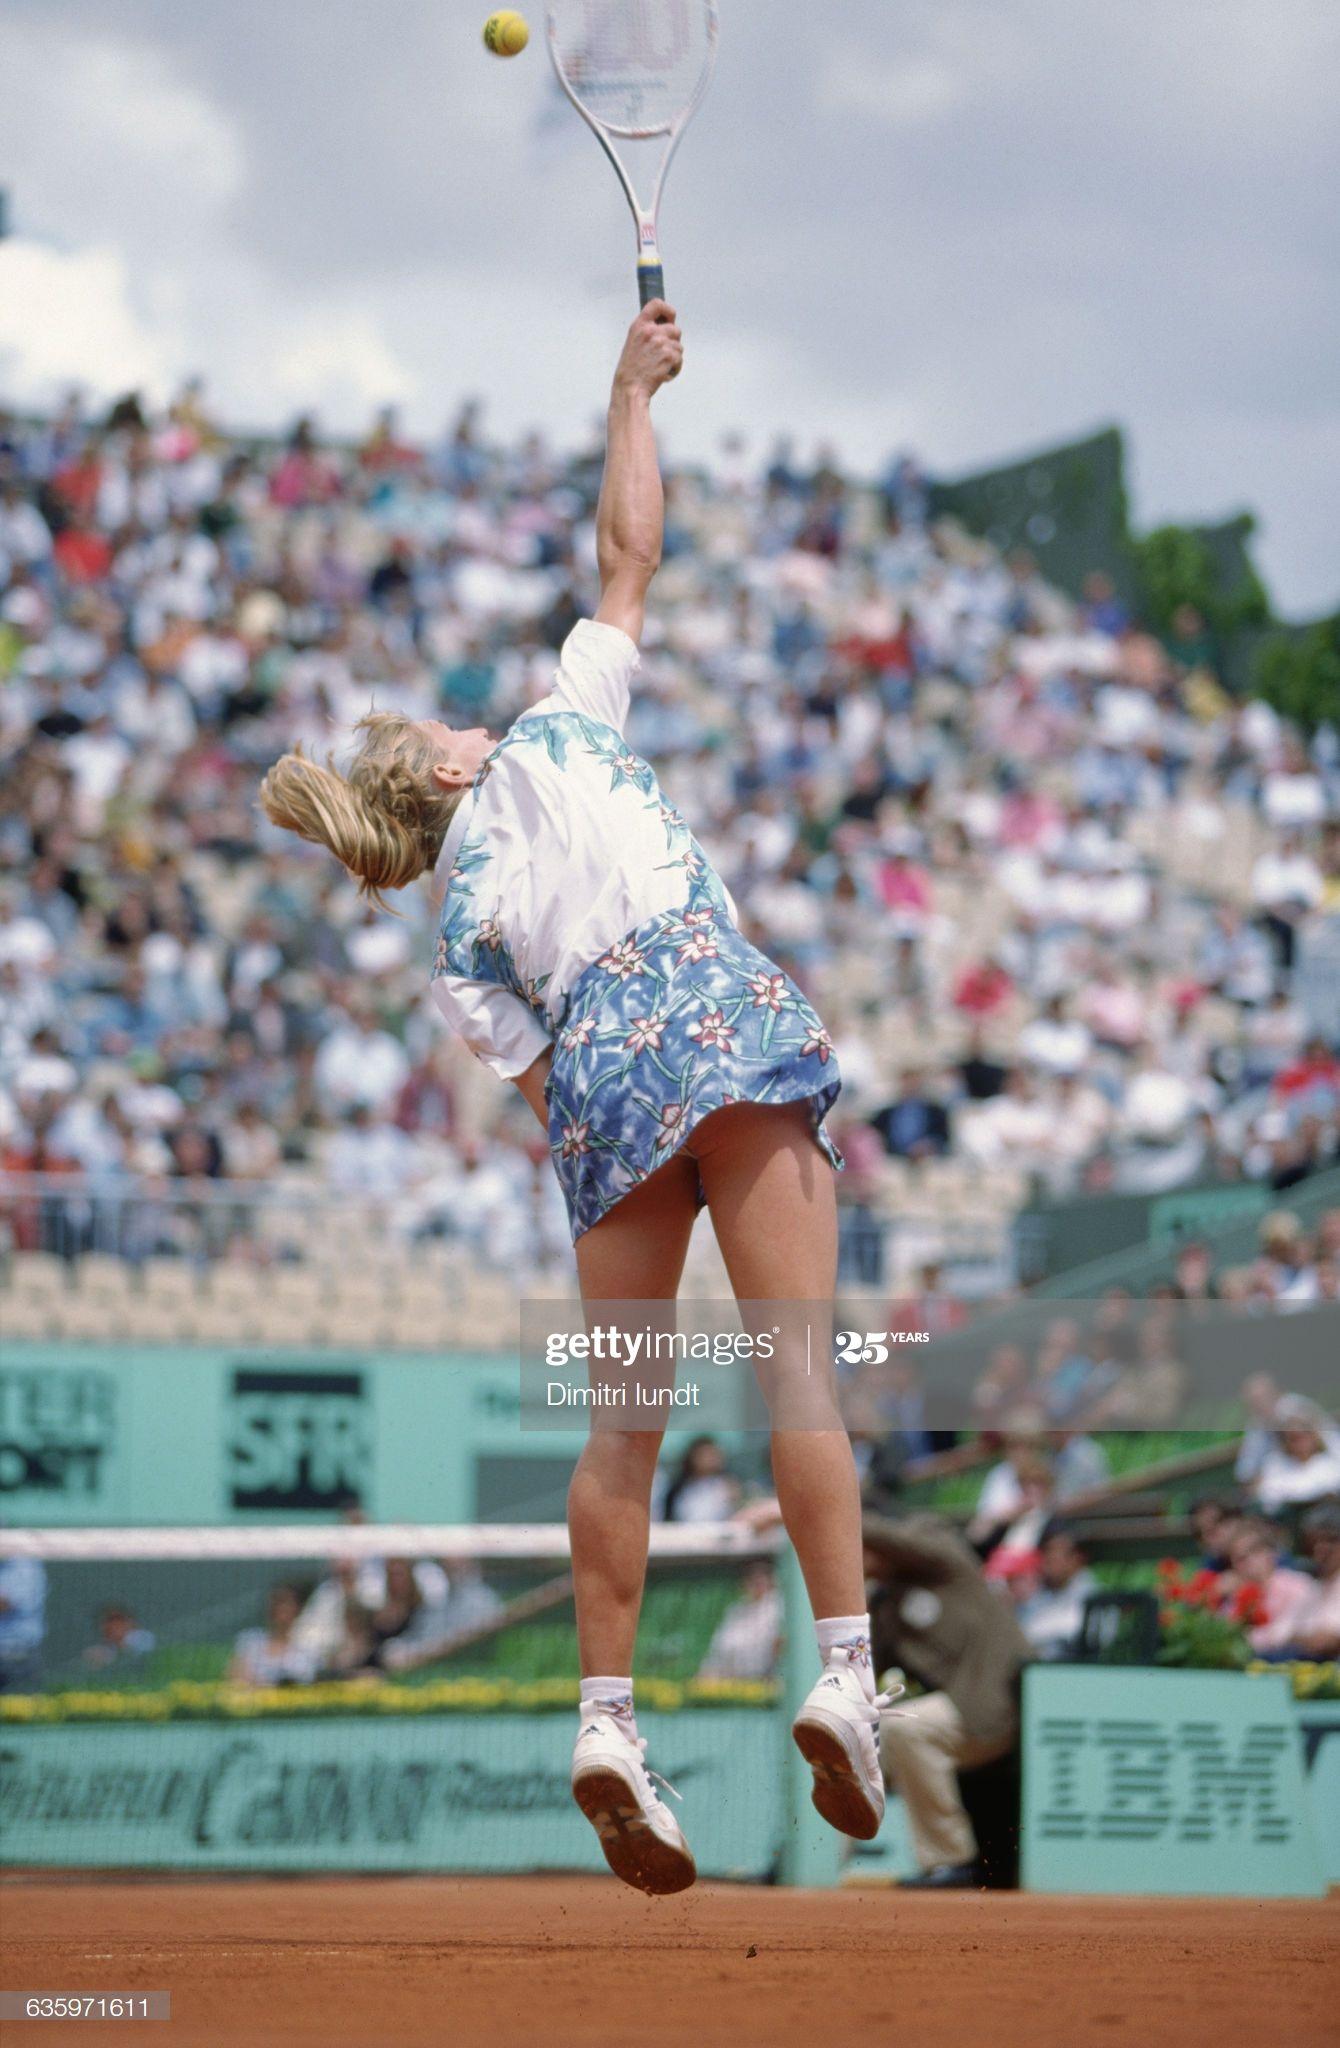 German Tennis Player Steffi Graf Competing At The 1995 French Open At Joueur De Tennis Steffi Graf Steffi Graff